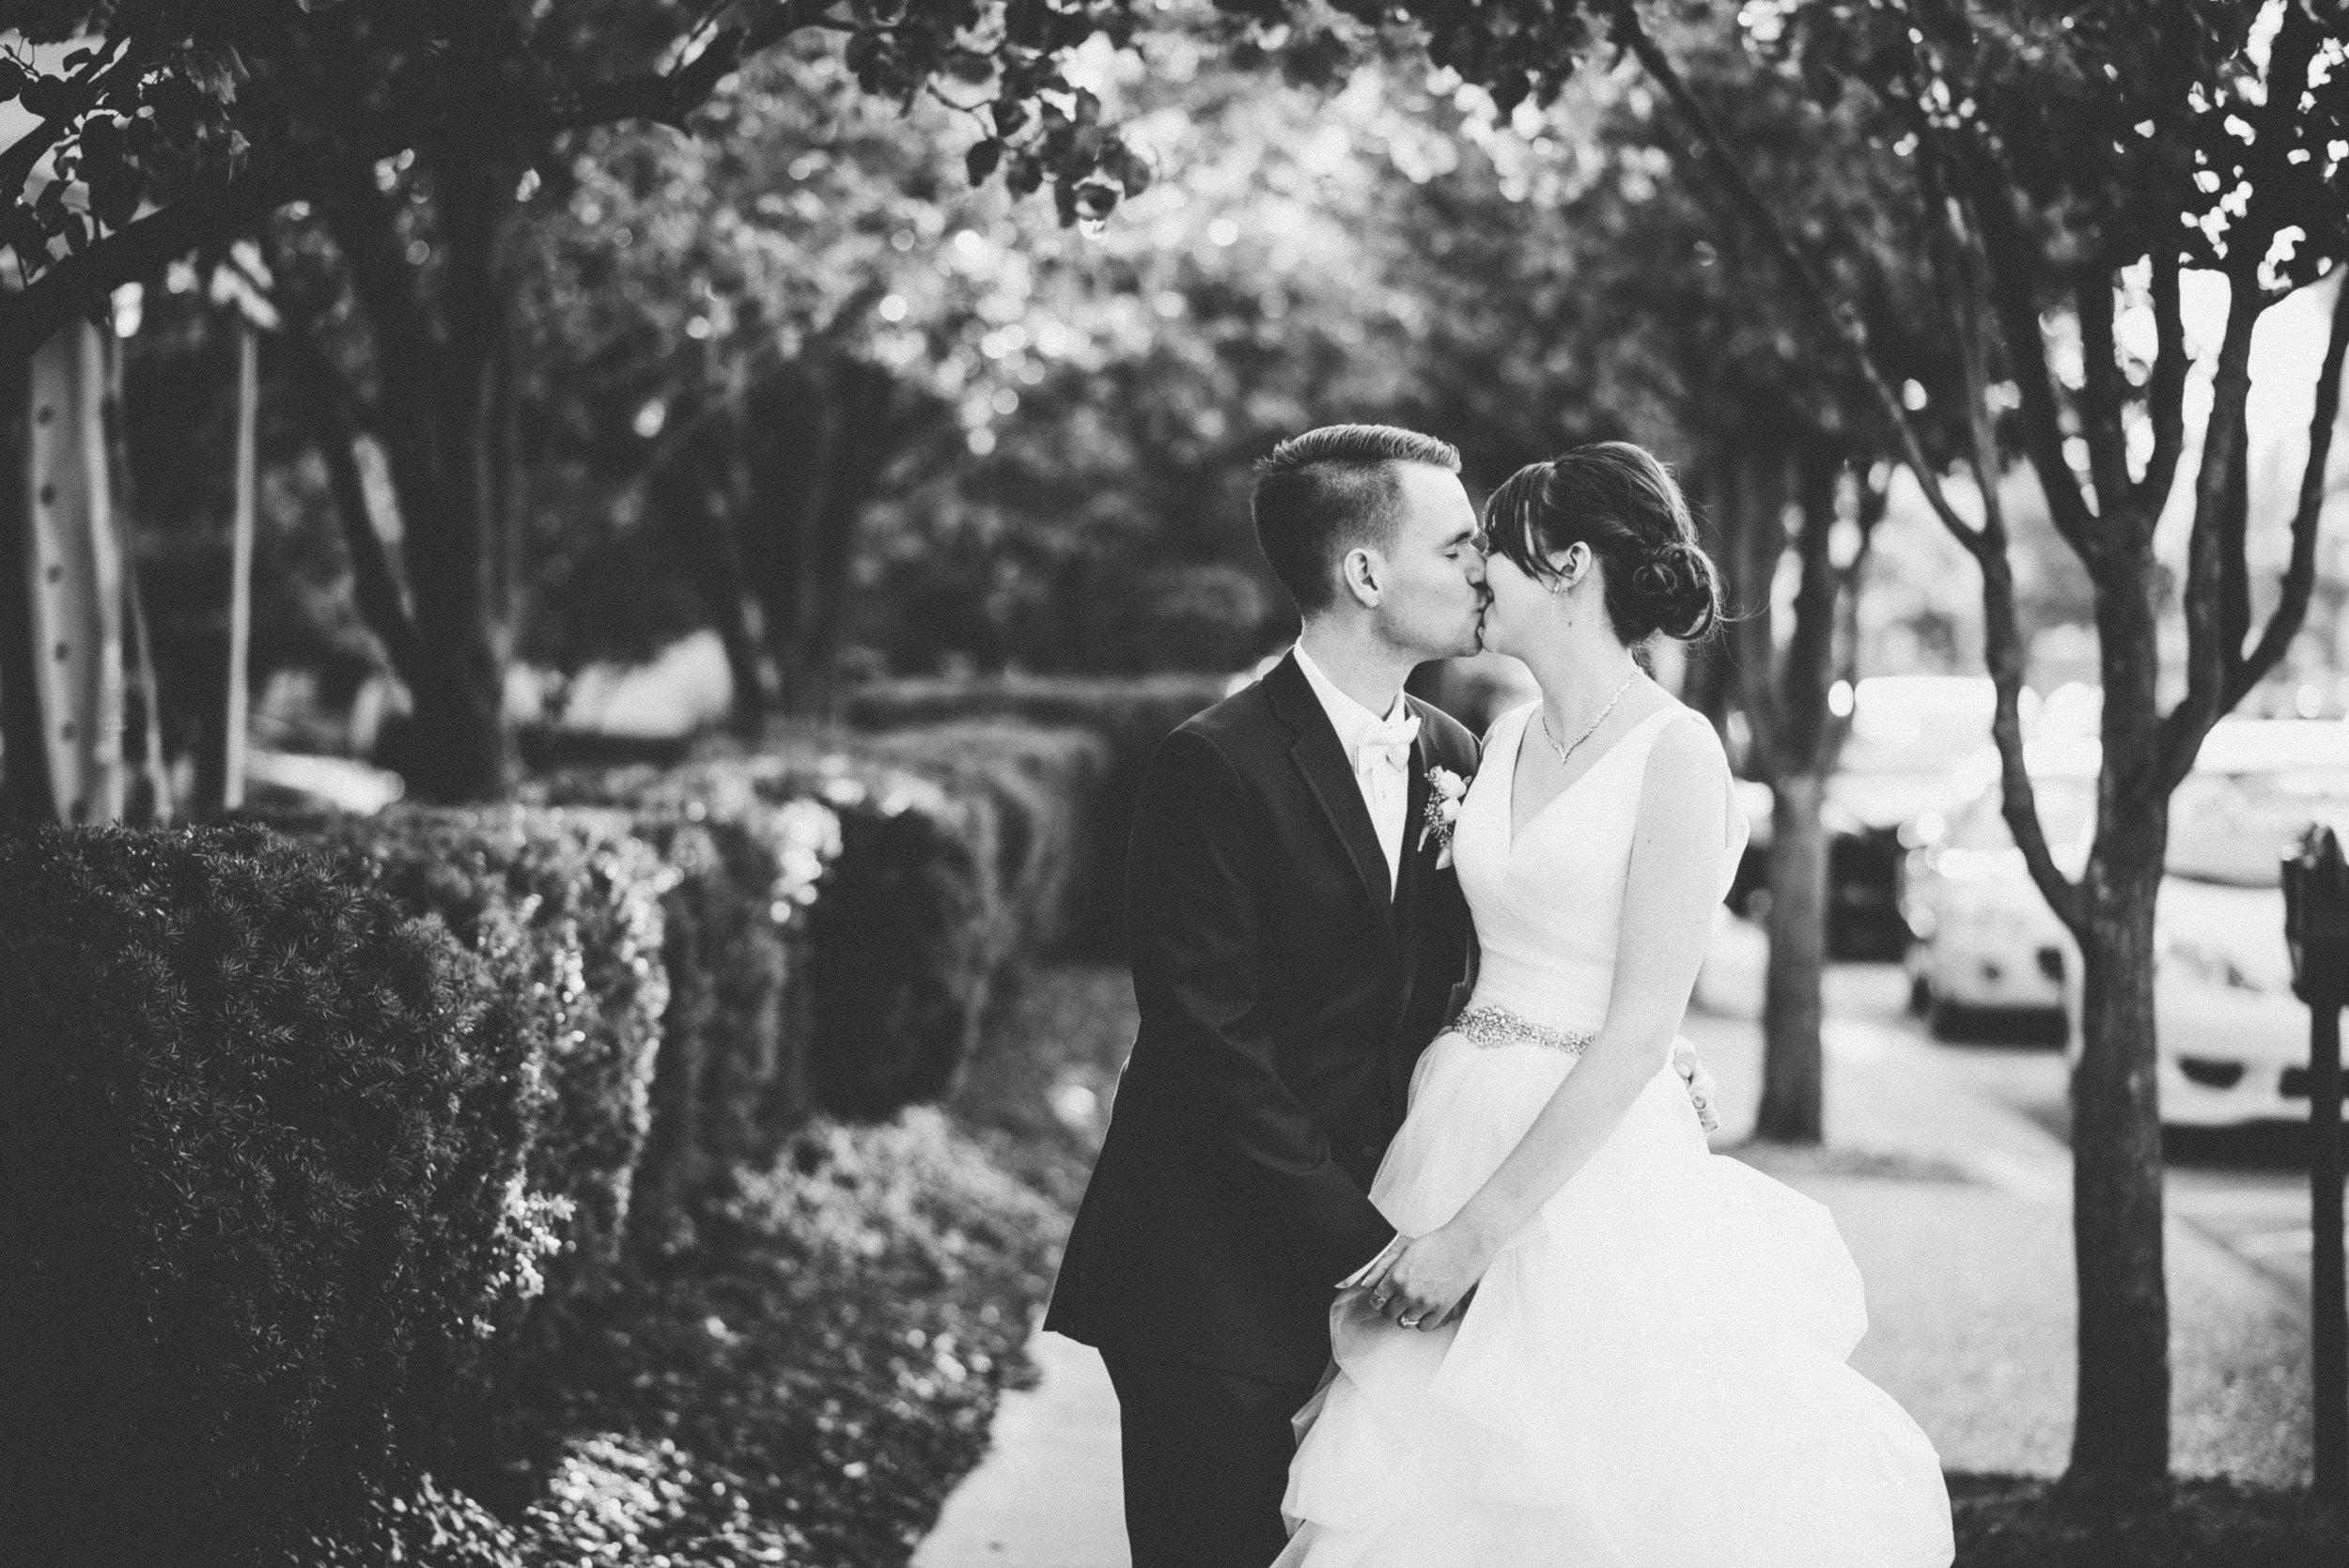 Kara and Mike Wedding-20160904-18-47-31.jpg